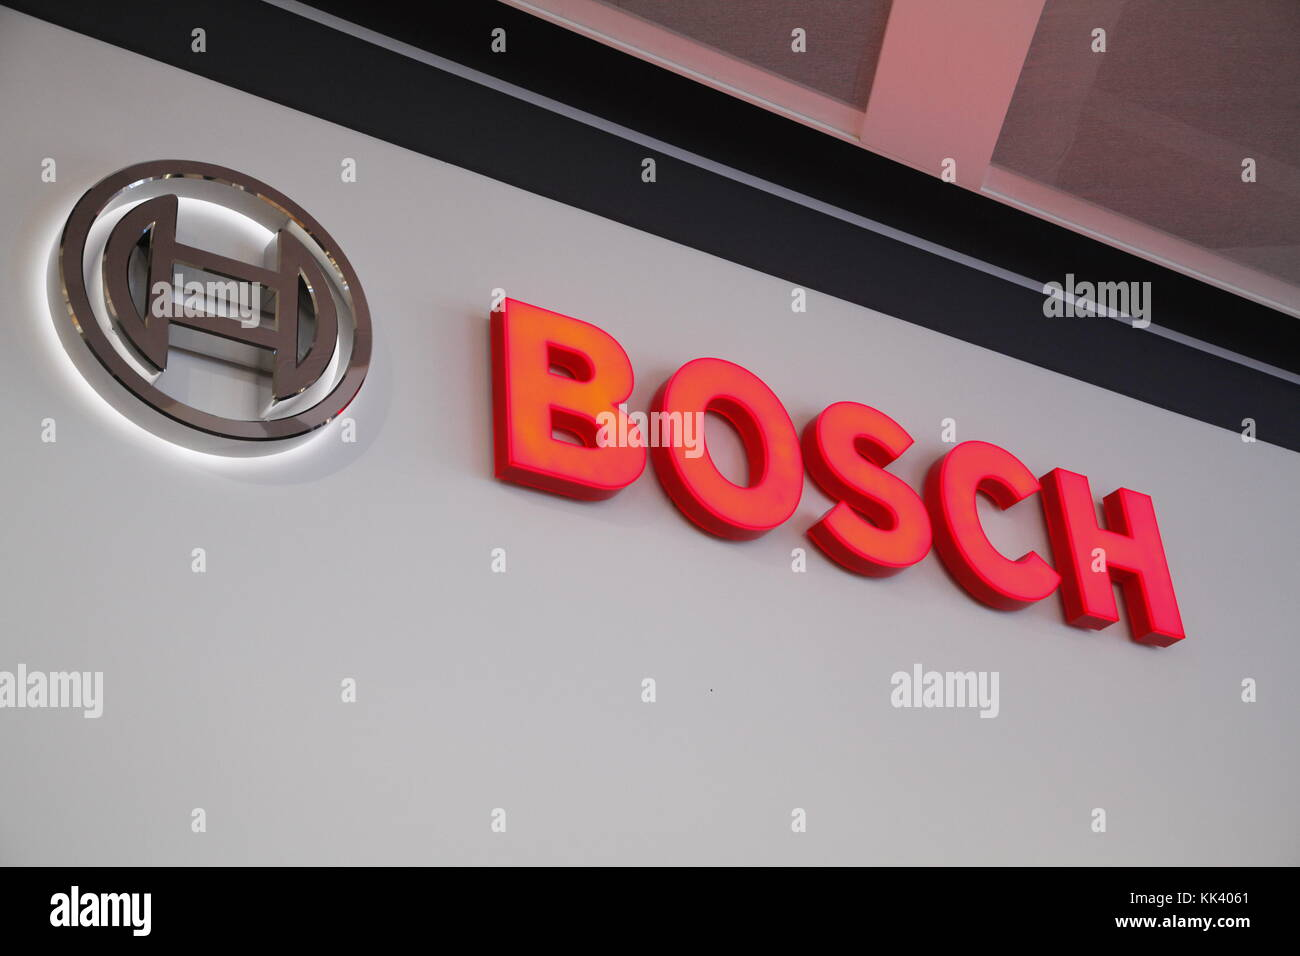 Bosch label - Stock Image